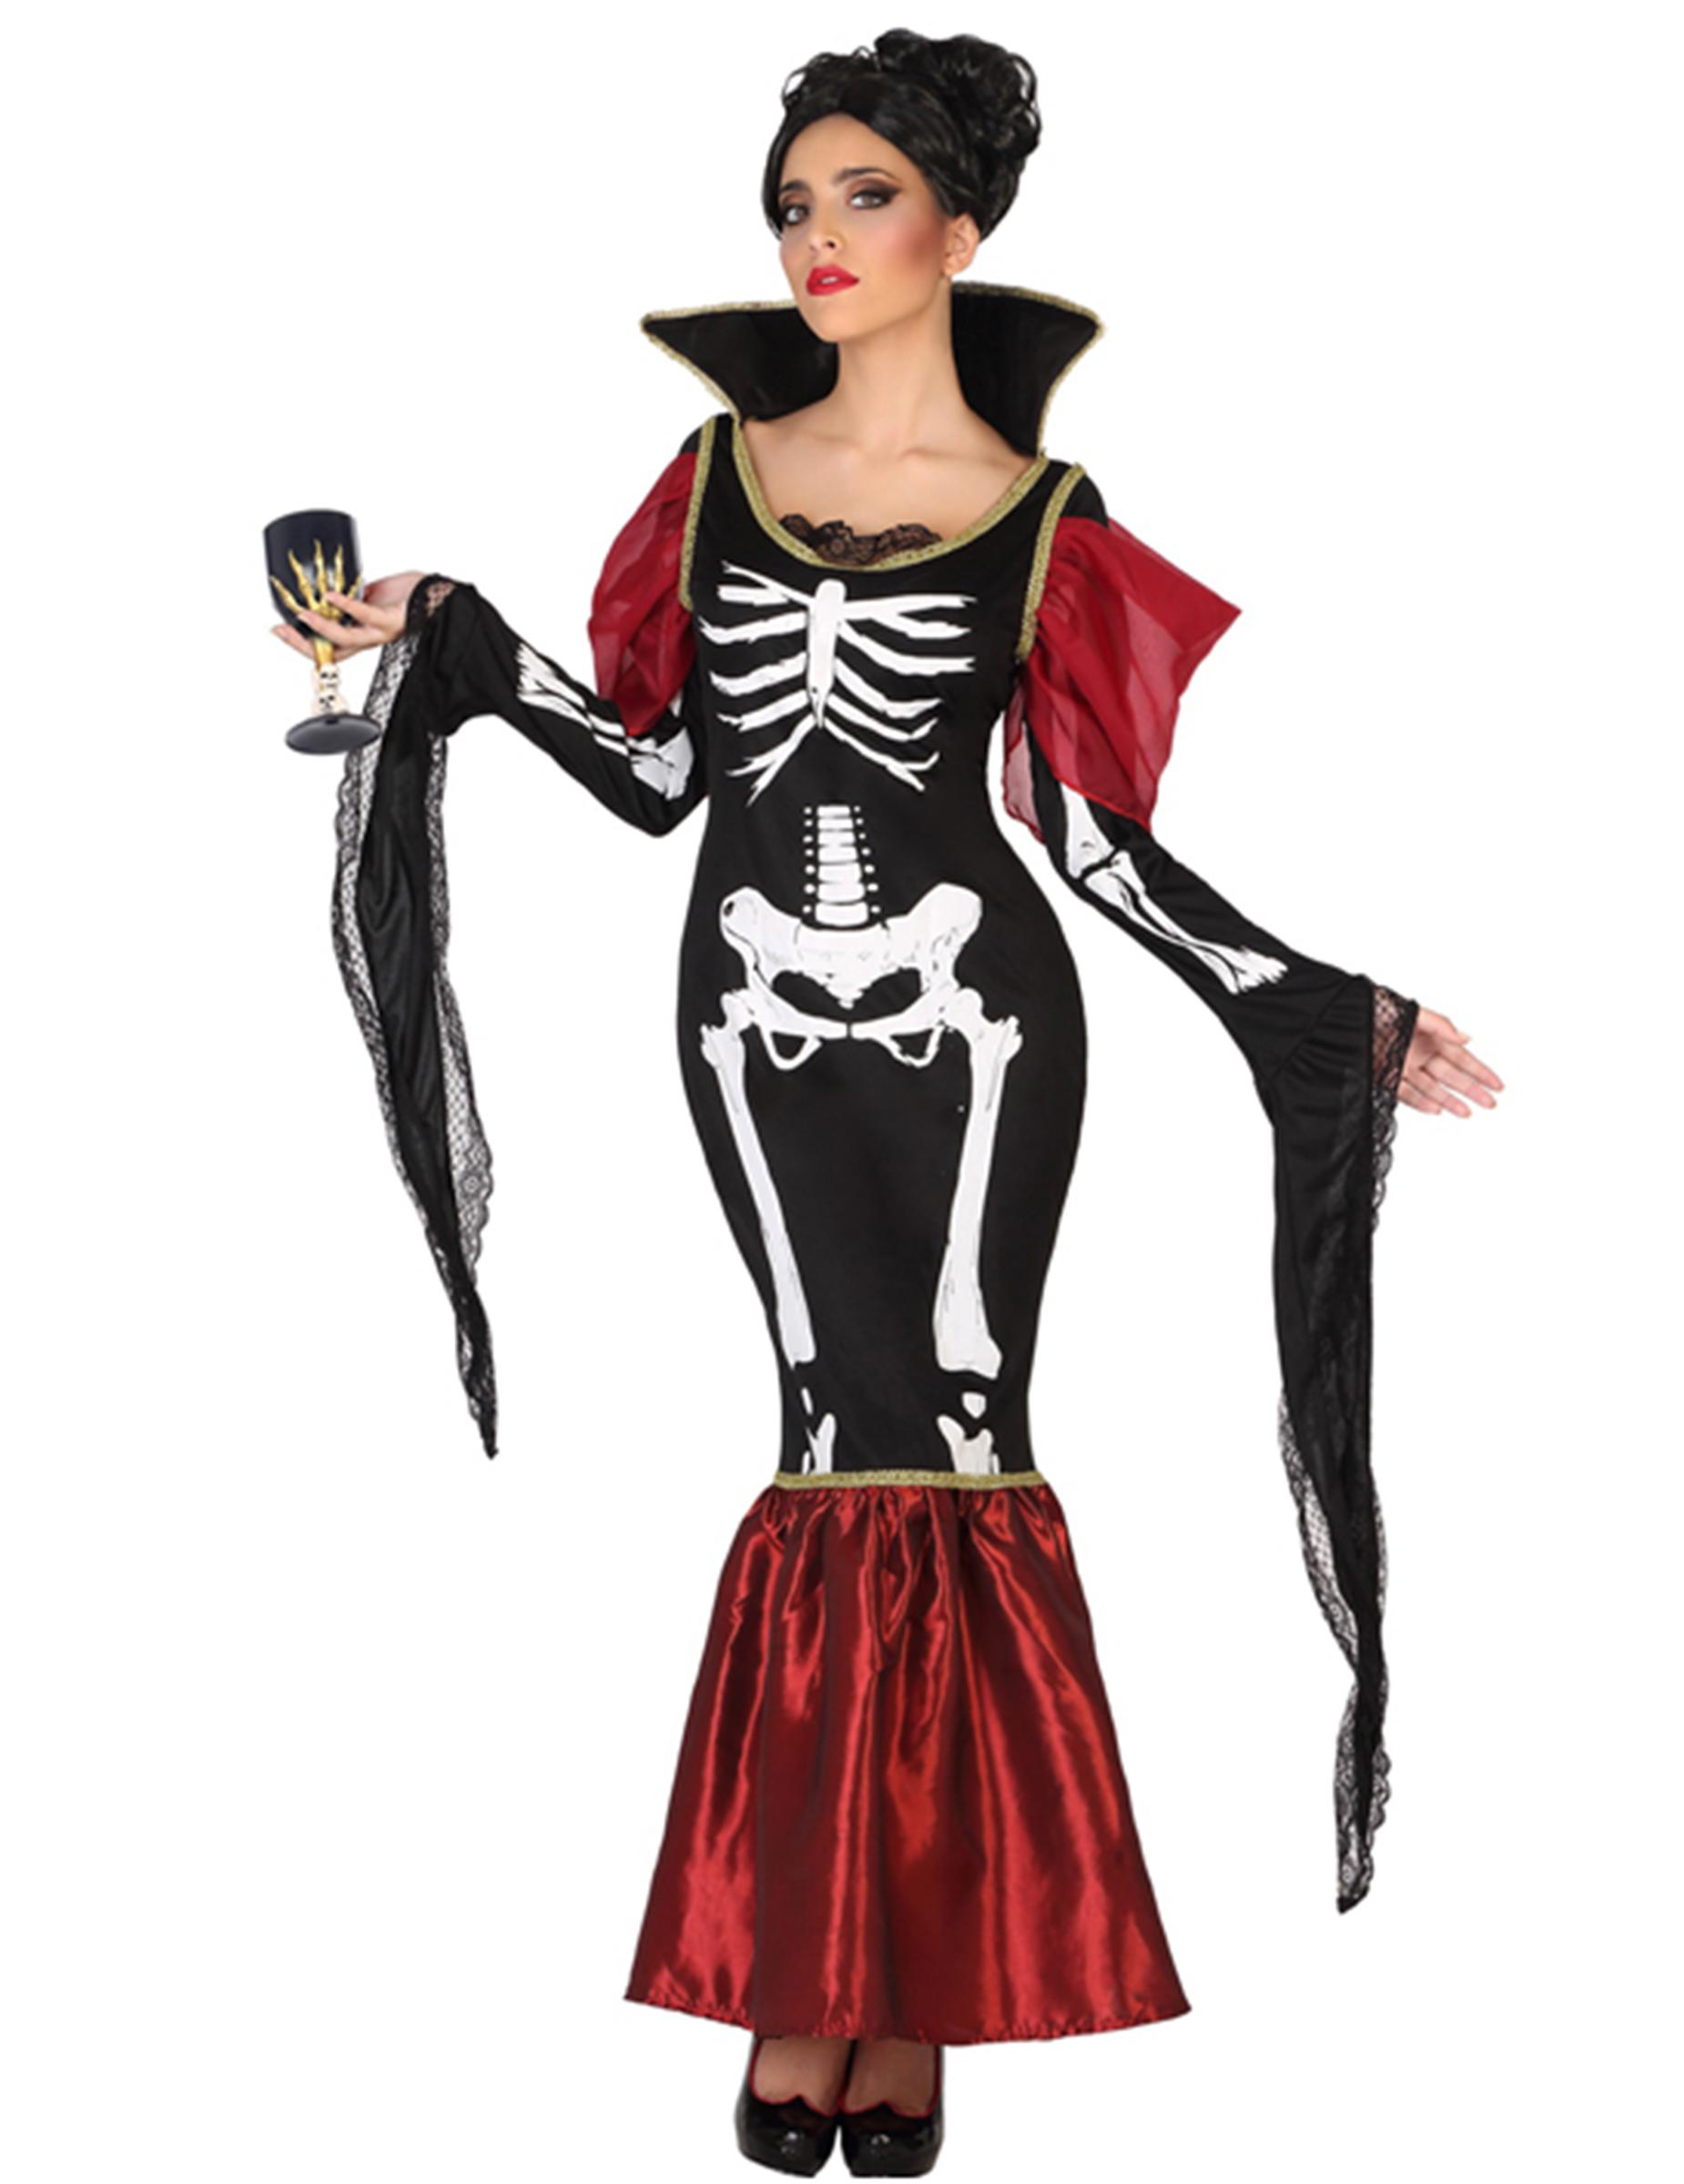 d guisement vampire squelette femme halloween deguise. Black Bedroom Furniture Sets. Home Design Ideas